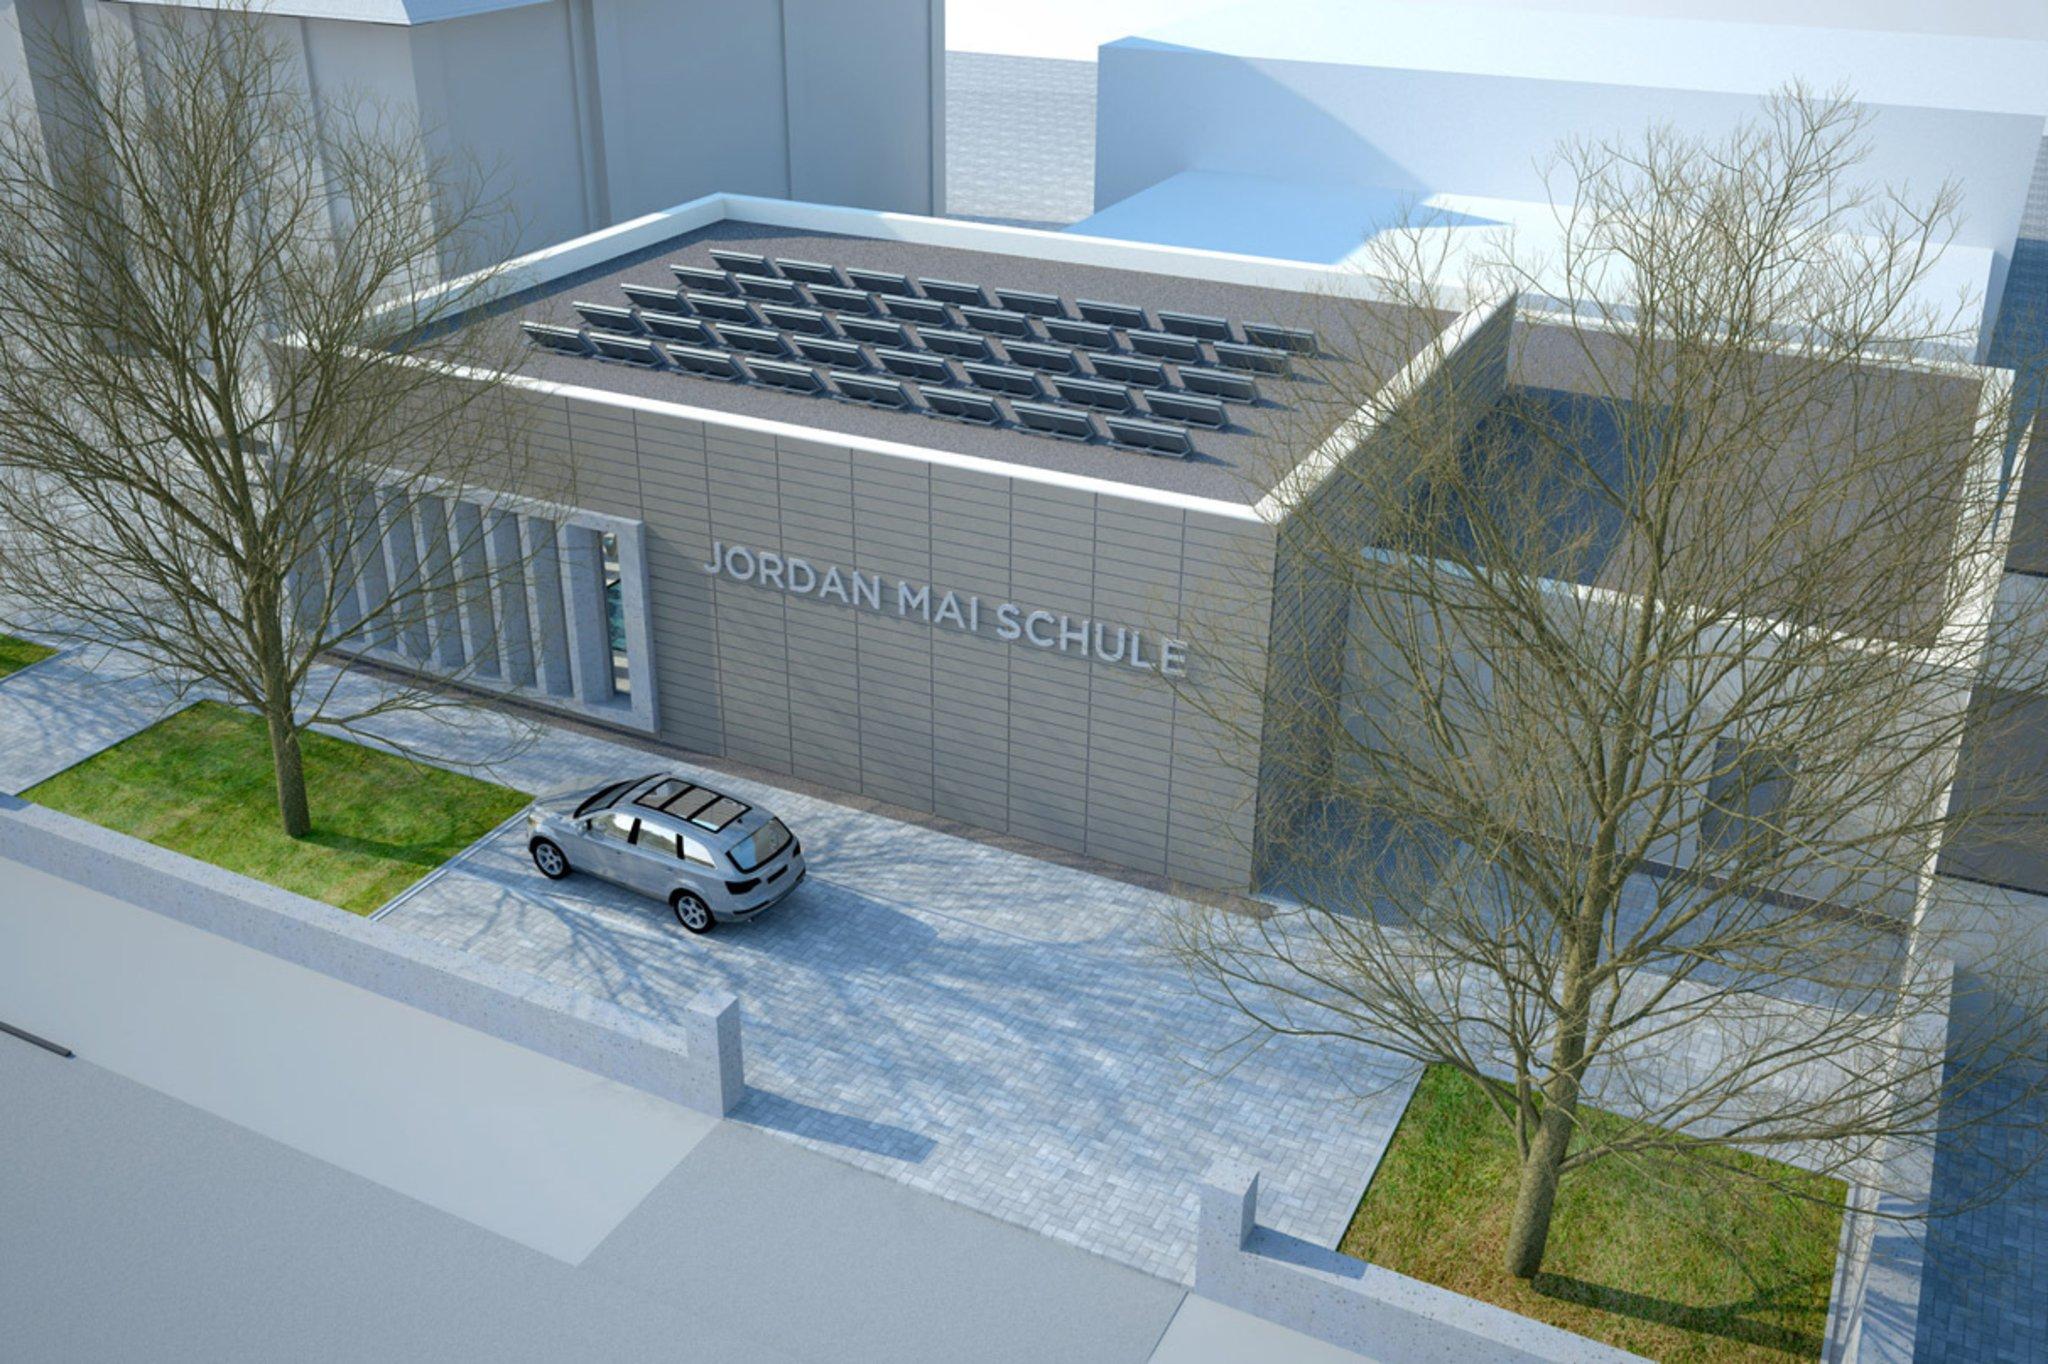 Bistum baut bewegungsbad an der jordan mai schule for Schwimmbad mulheim an der ruhr